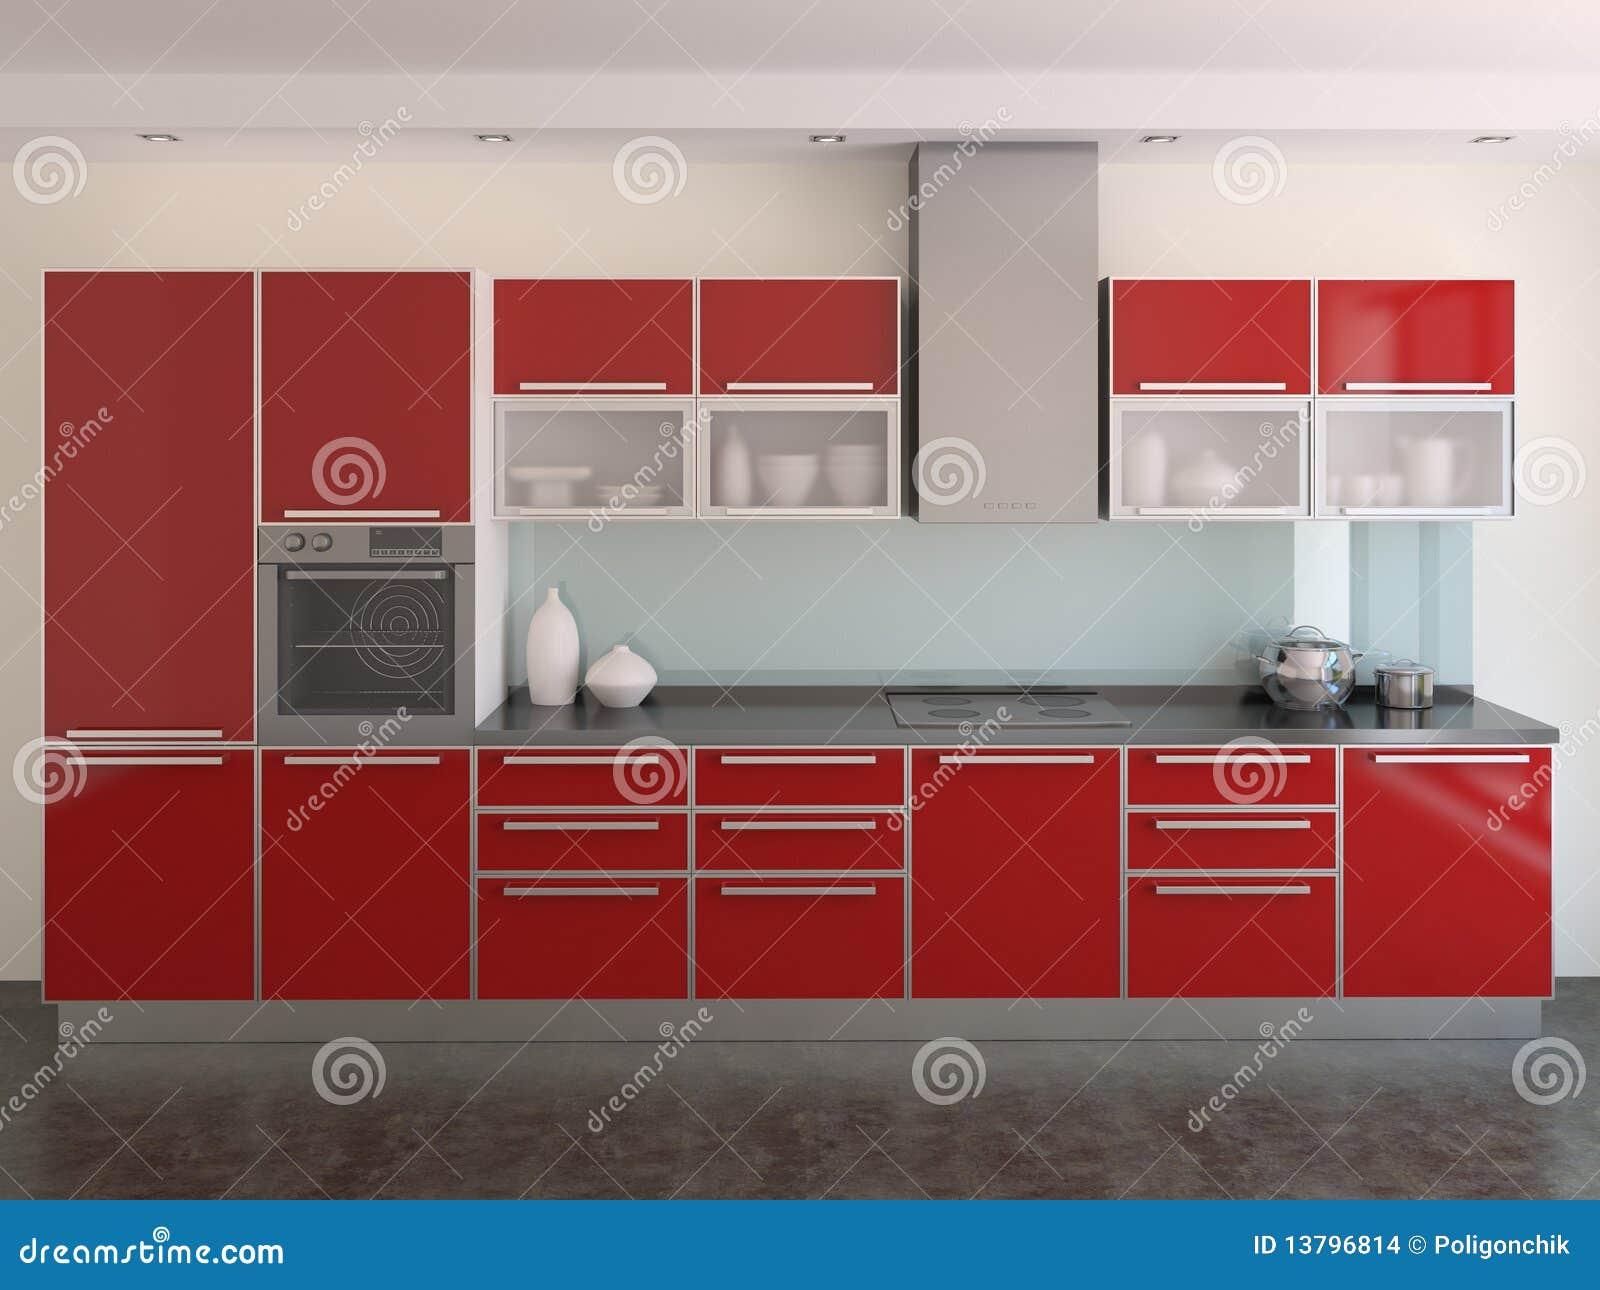 Cocina roja moderna foto de archivo imagen de horno 13796814 - Cosa mettere al posto delle piastrelle in cucina ...